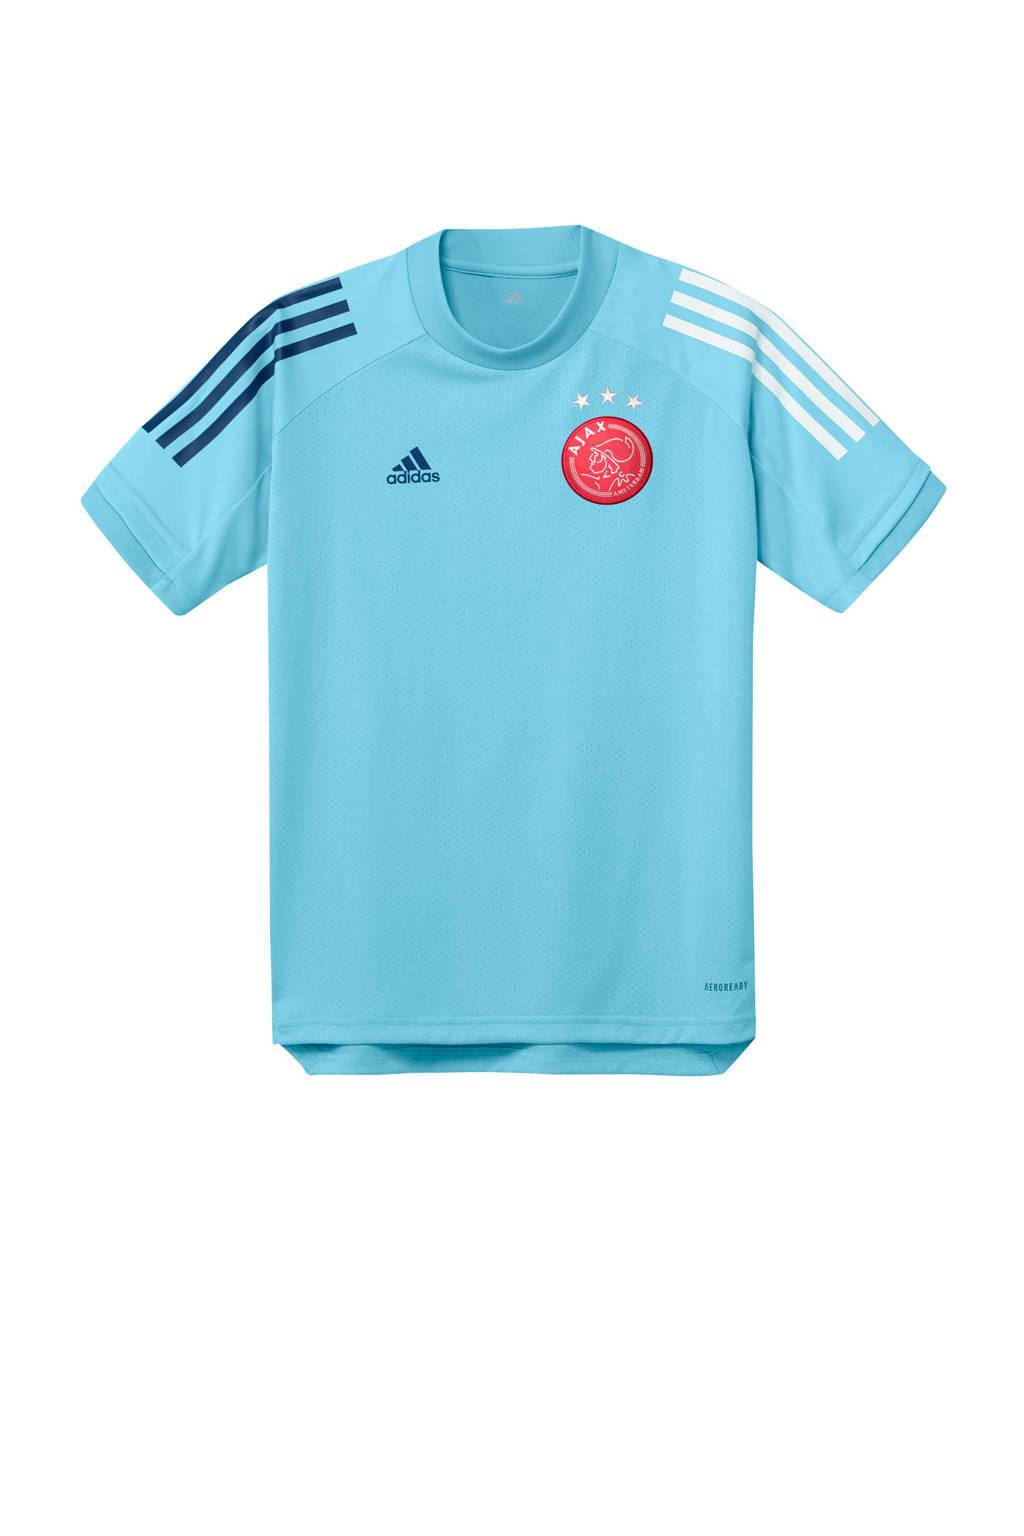 adidas Performance Junior Ajax training T-shirt lichtblauw, Lichtblauw